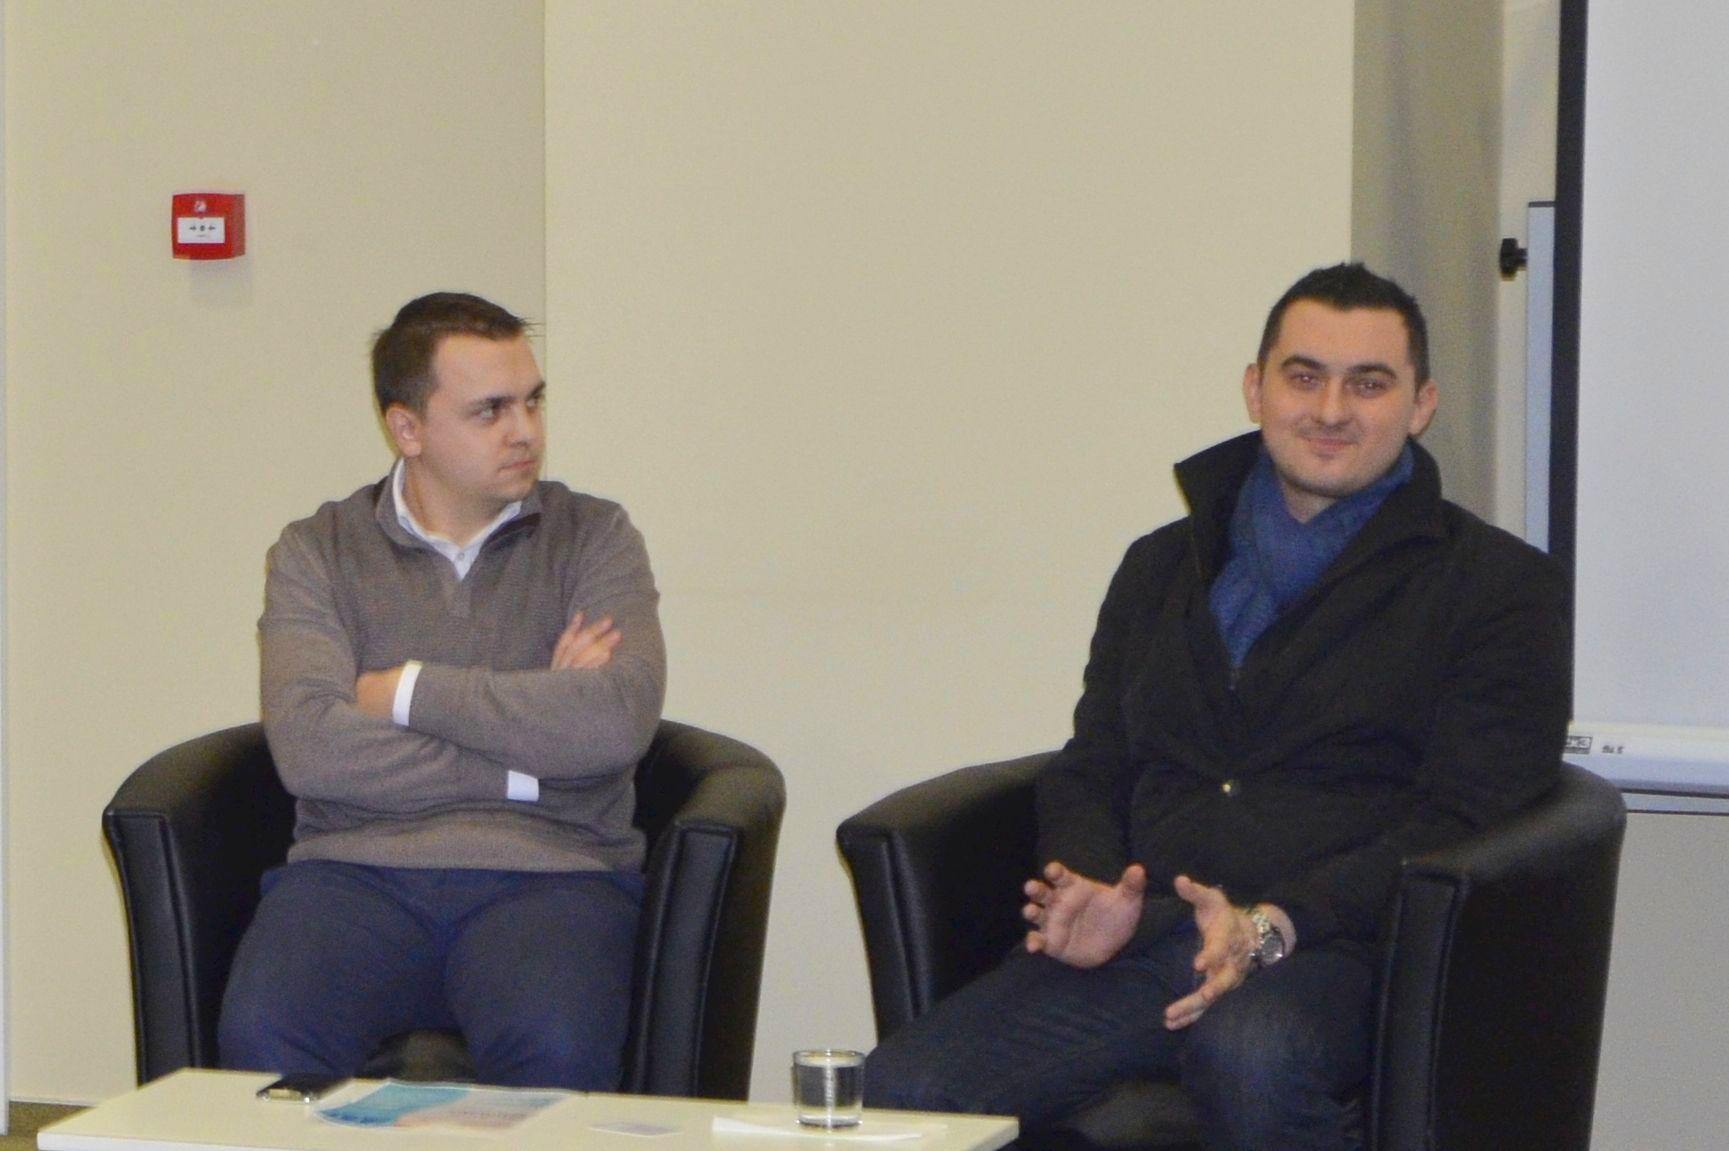 Predavanje dr. Amira Selimagica decembar 2017 Fondacija Izvor nade